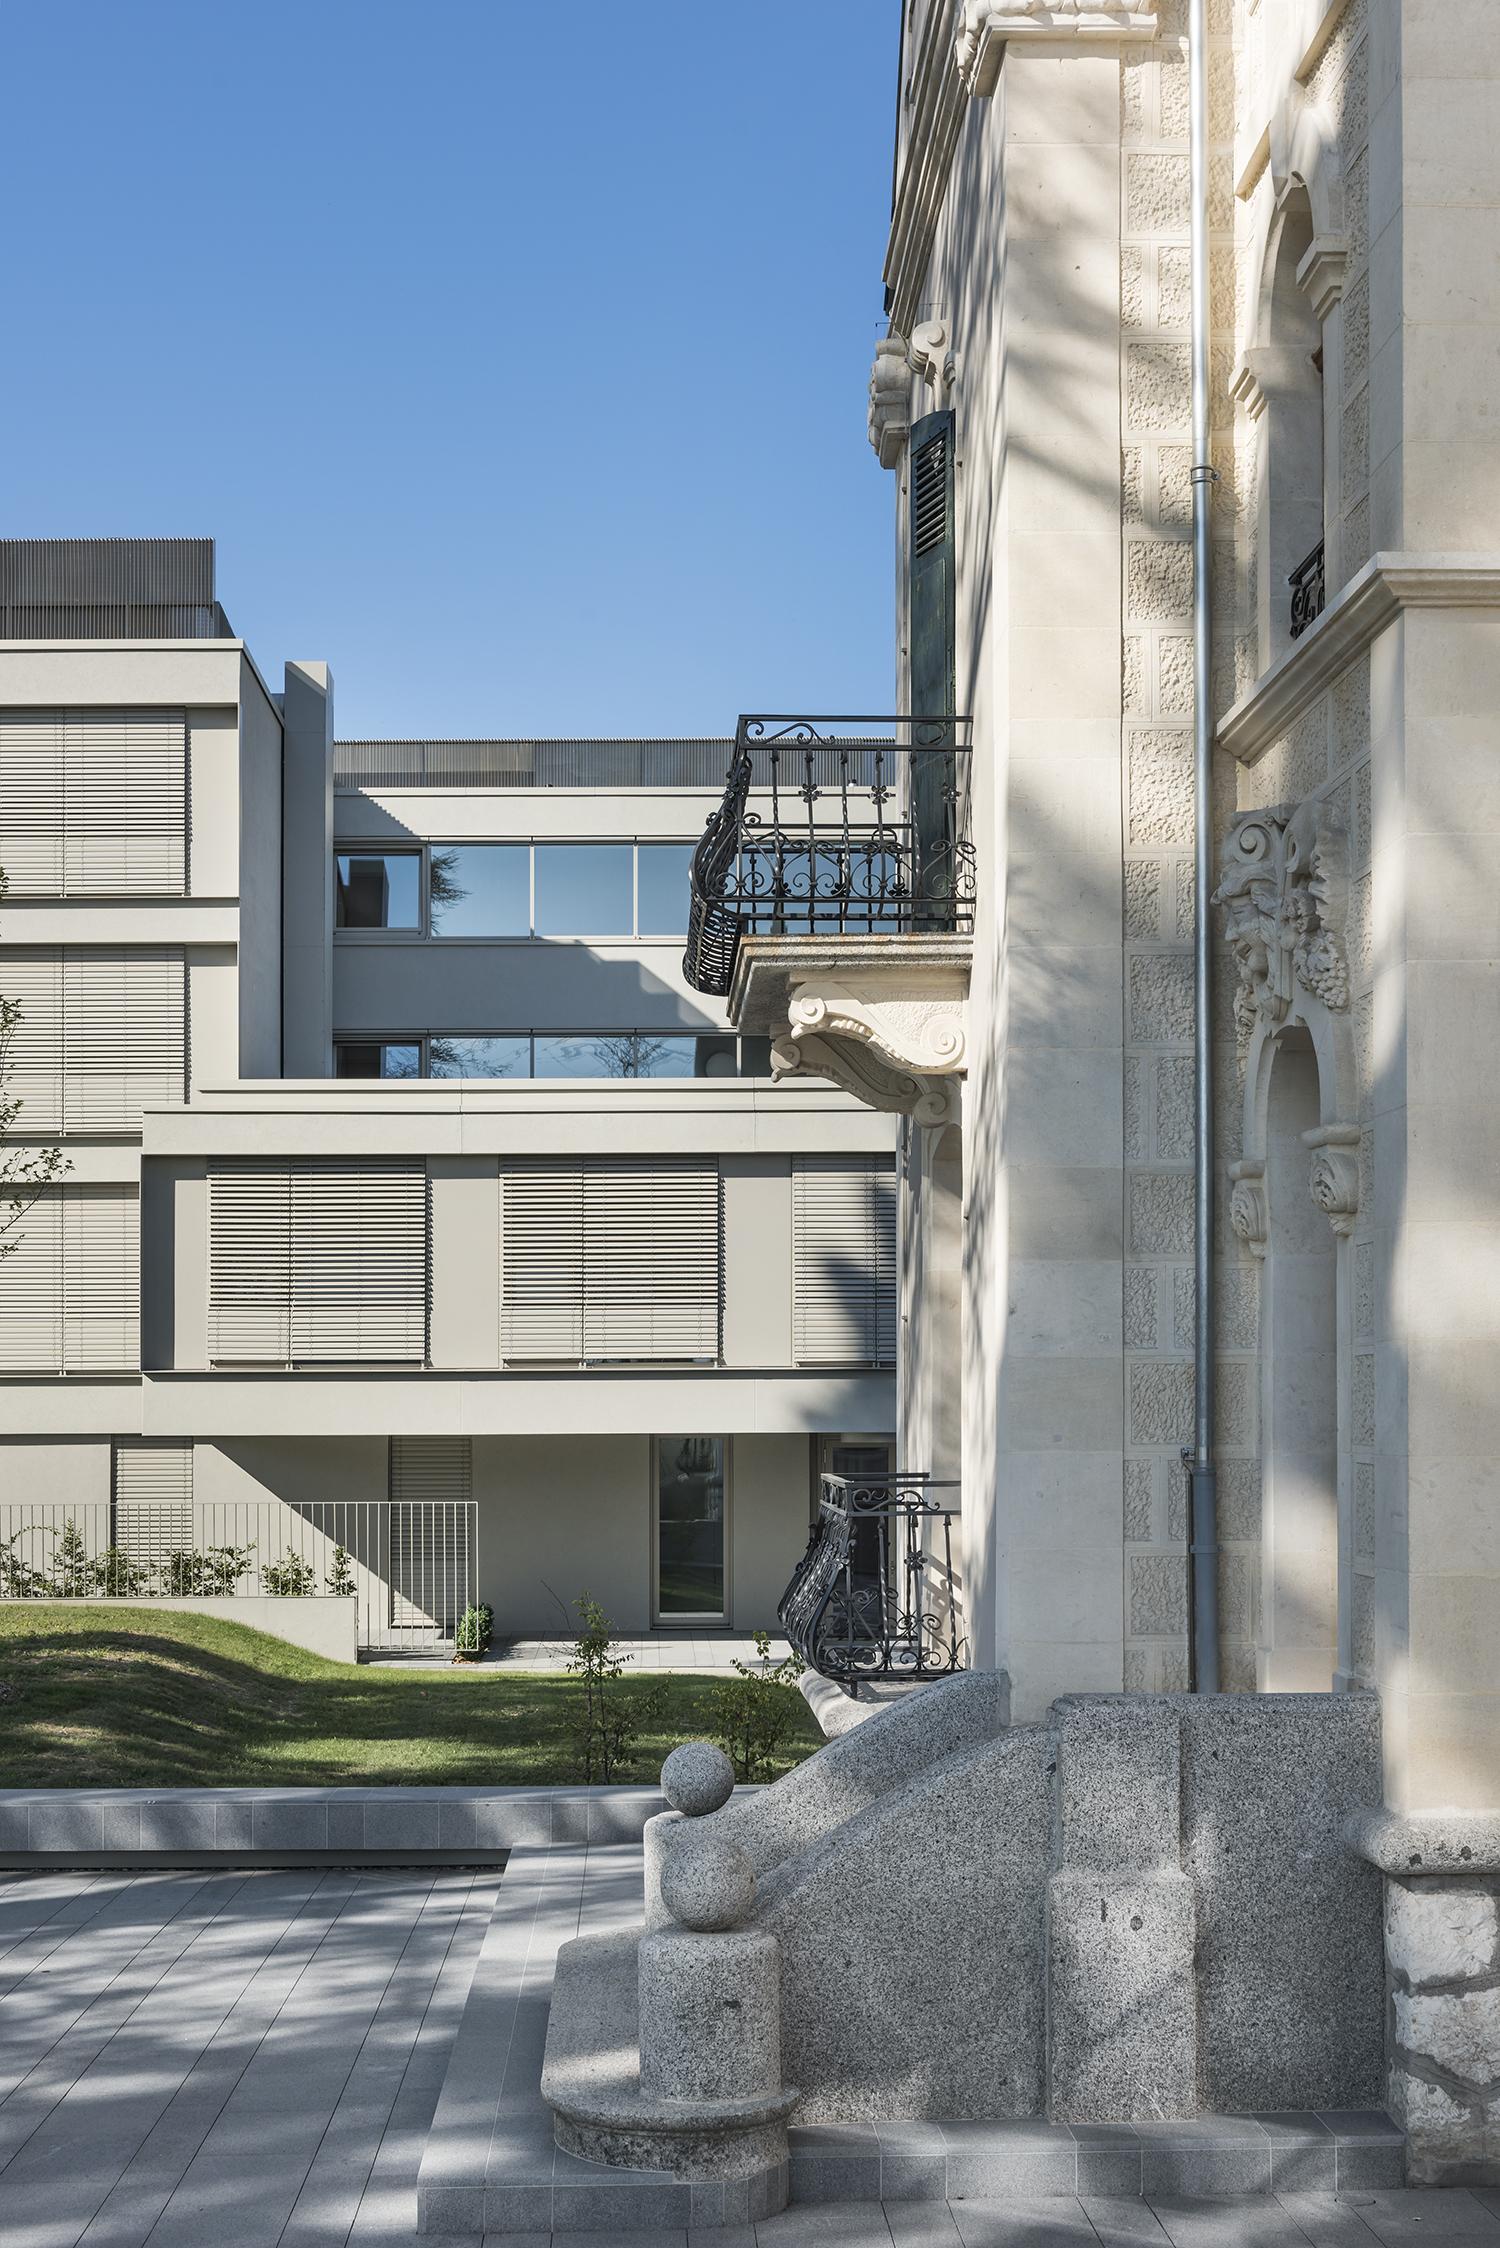 Home à Perly-GE, Amaldi Neder Architectes, Carouge Genève; 170